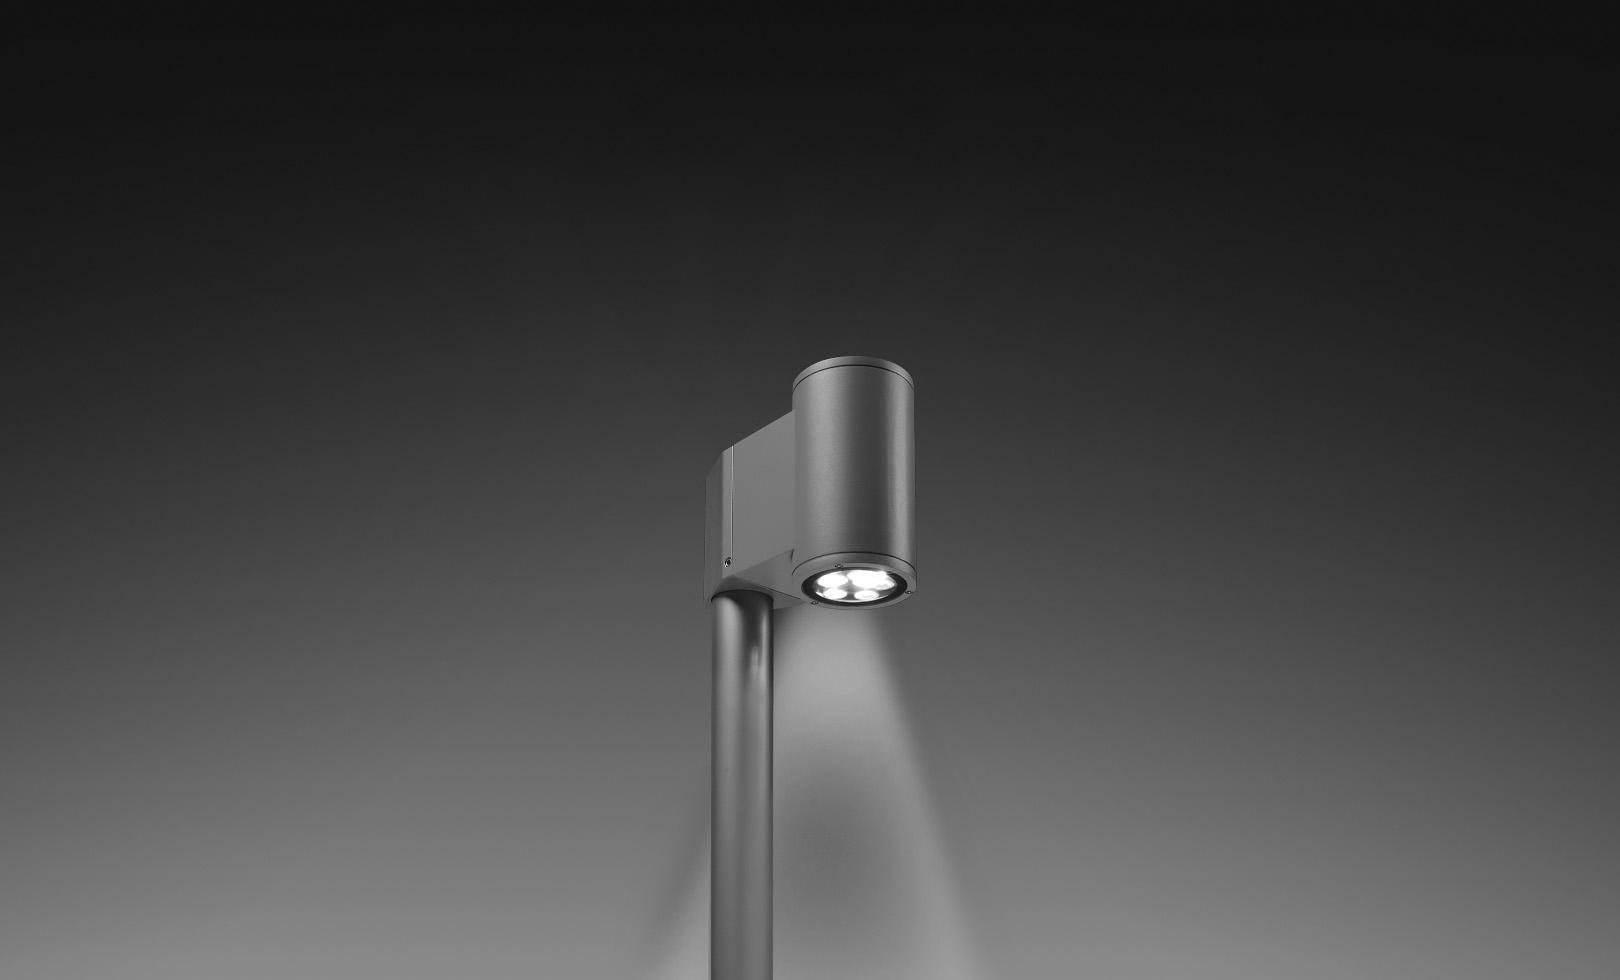 804005 SINGLE TECH POLE-TOP MEDIUM 01 ROUND PRO LED 1x14W 1